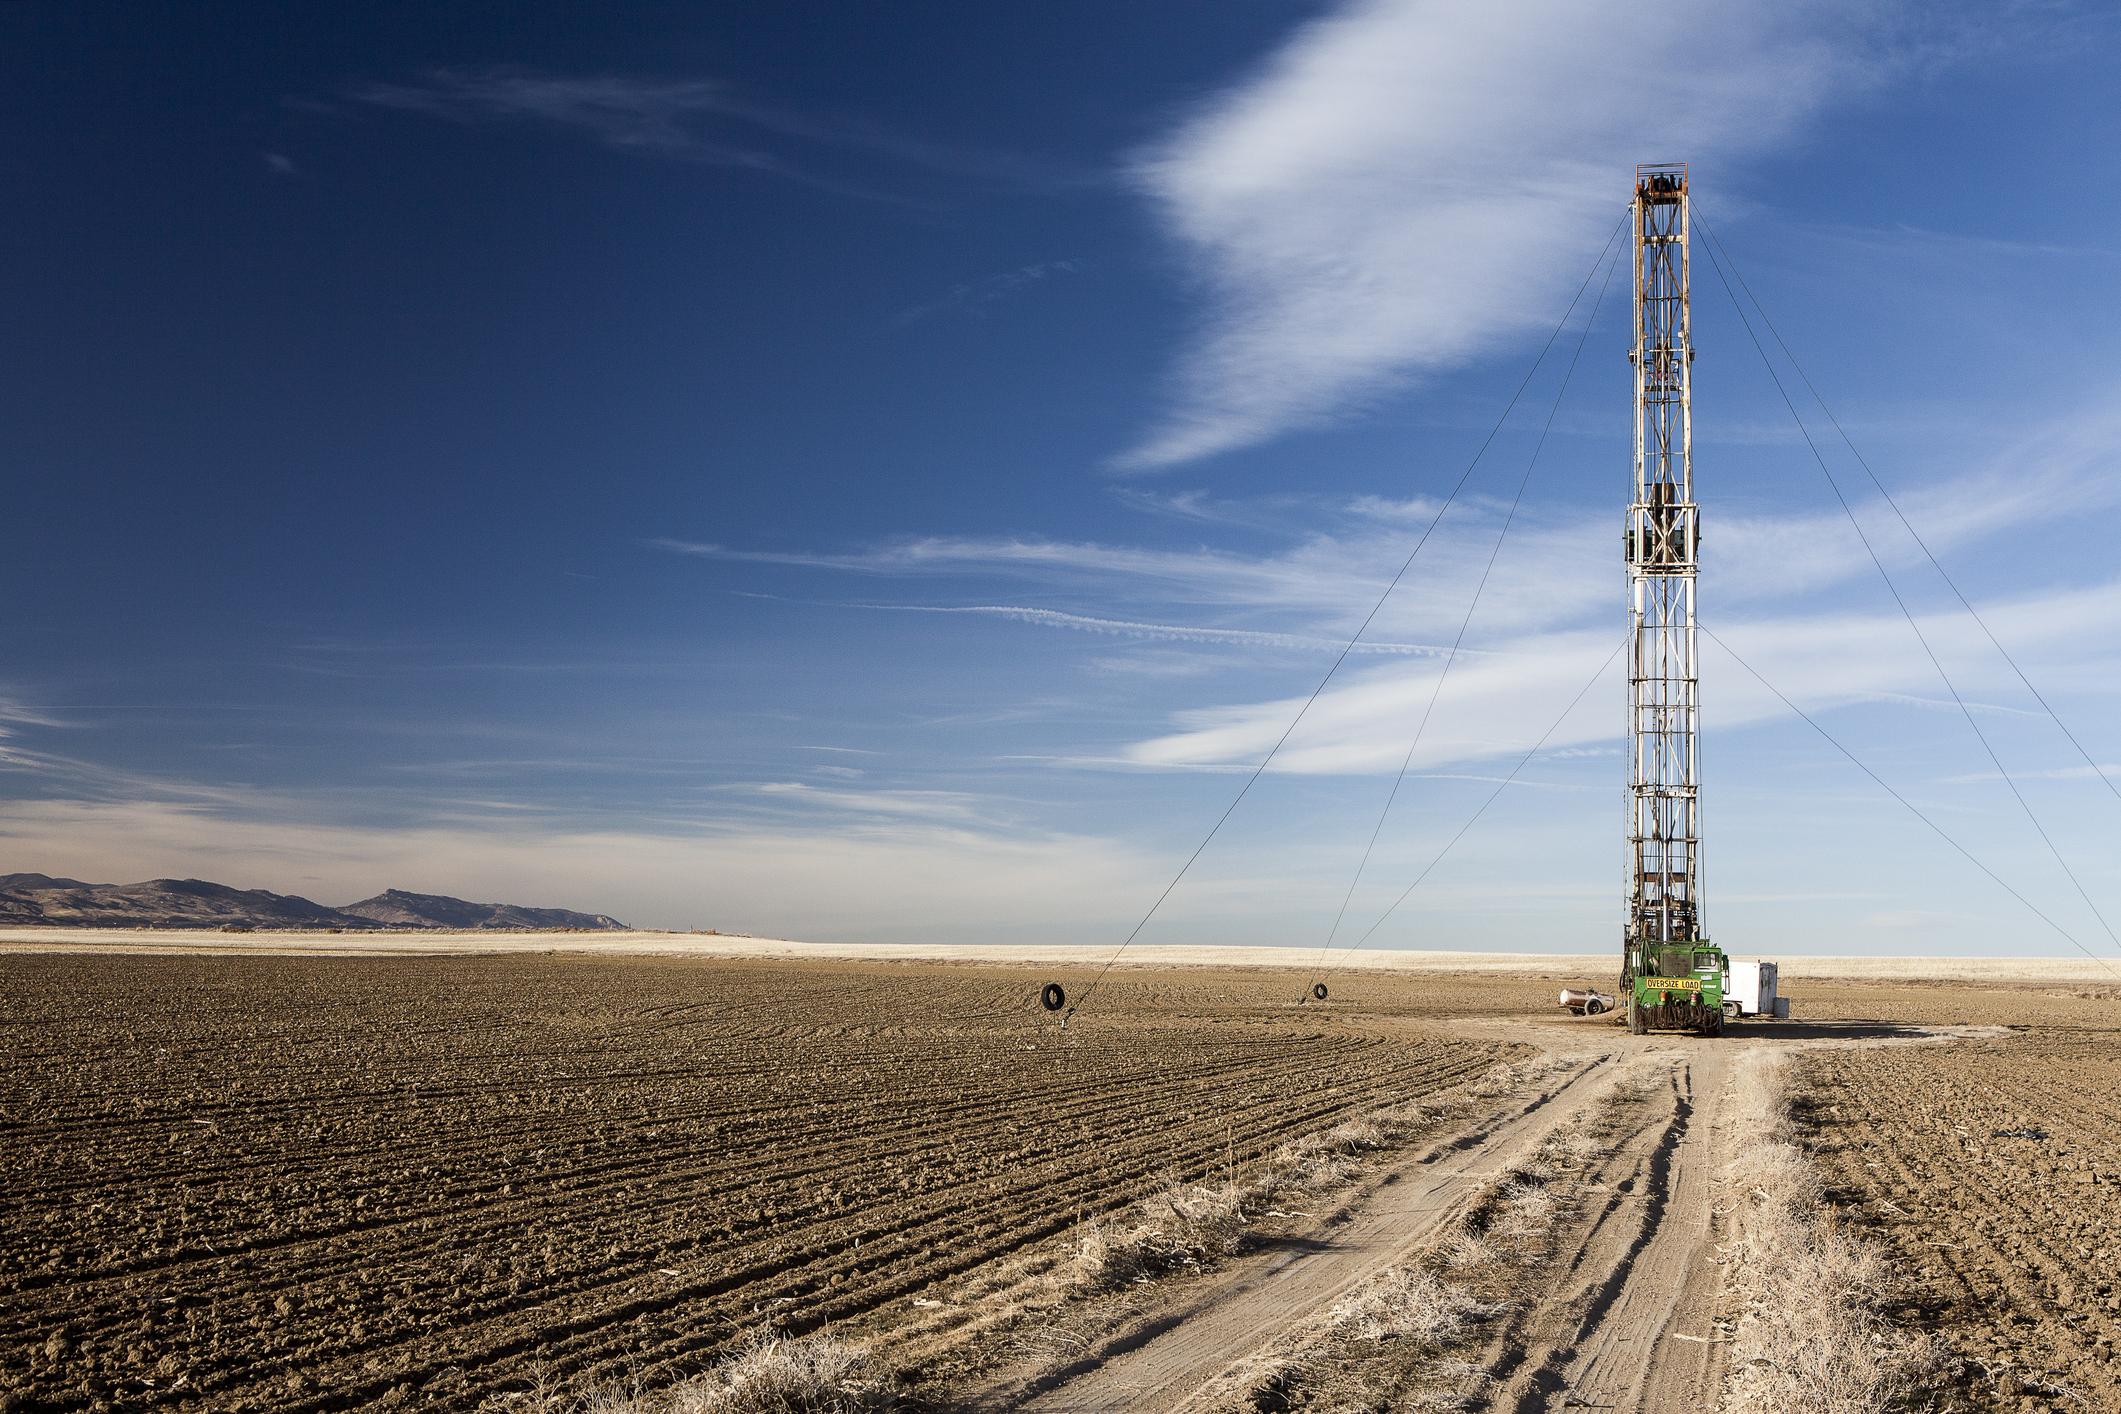 A shale drill in an open plain under a blue sky.